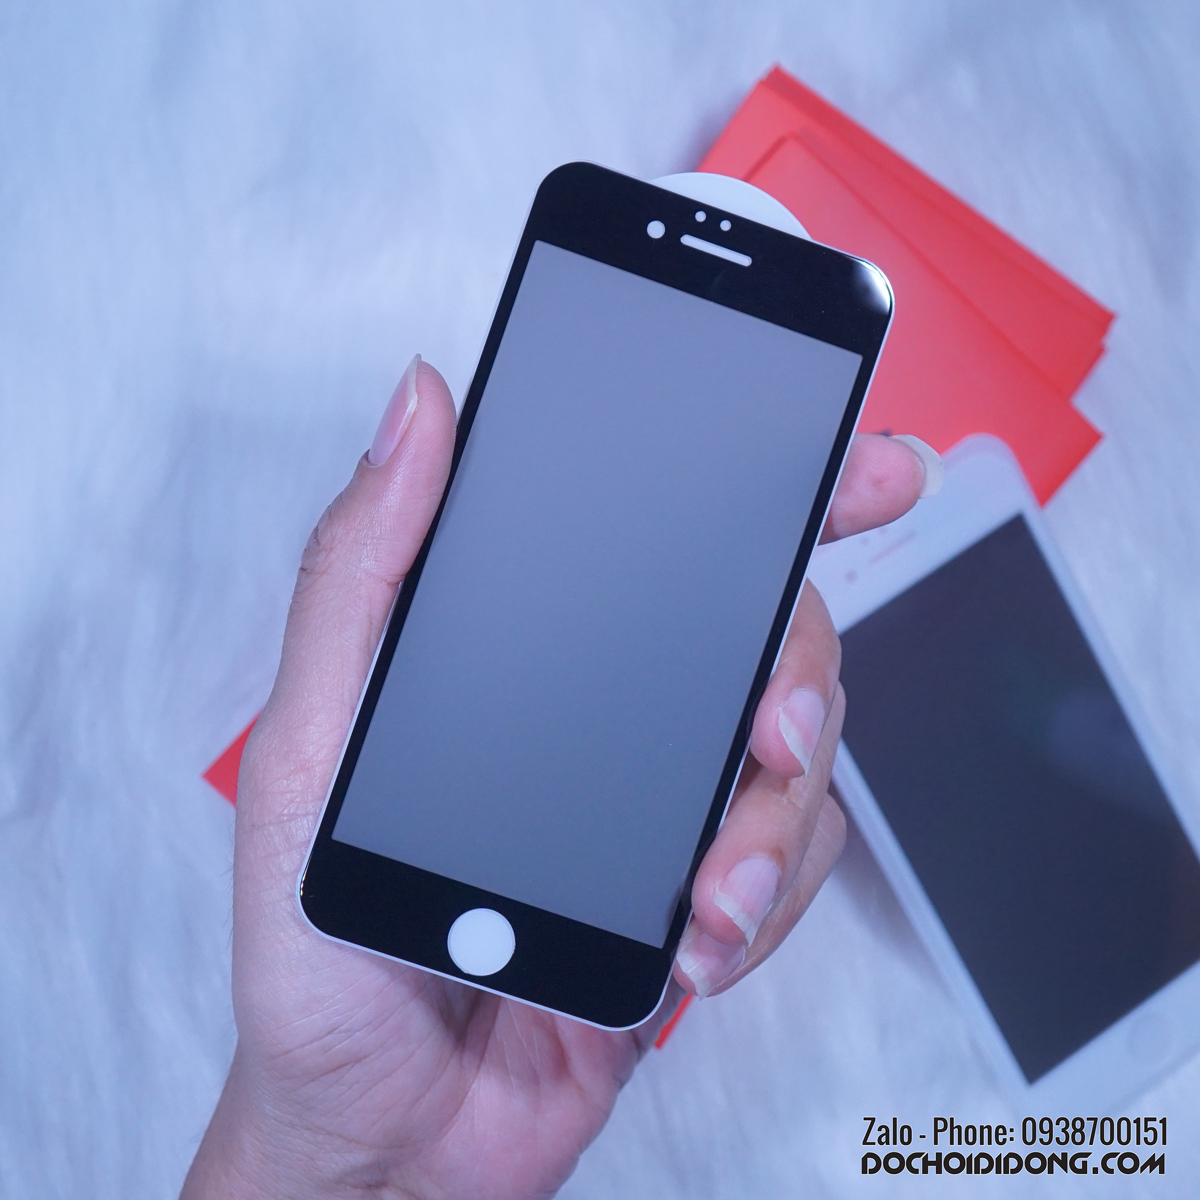 dan-cuong-luc-chong-nhin-trom-iphone-6-6s-zacase-anti-spy-full-man-hinh